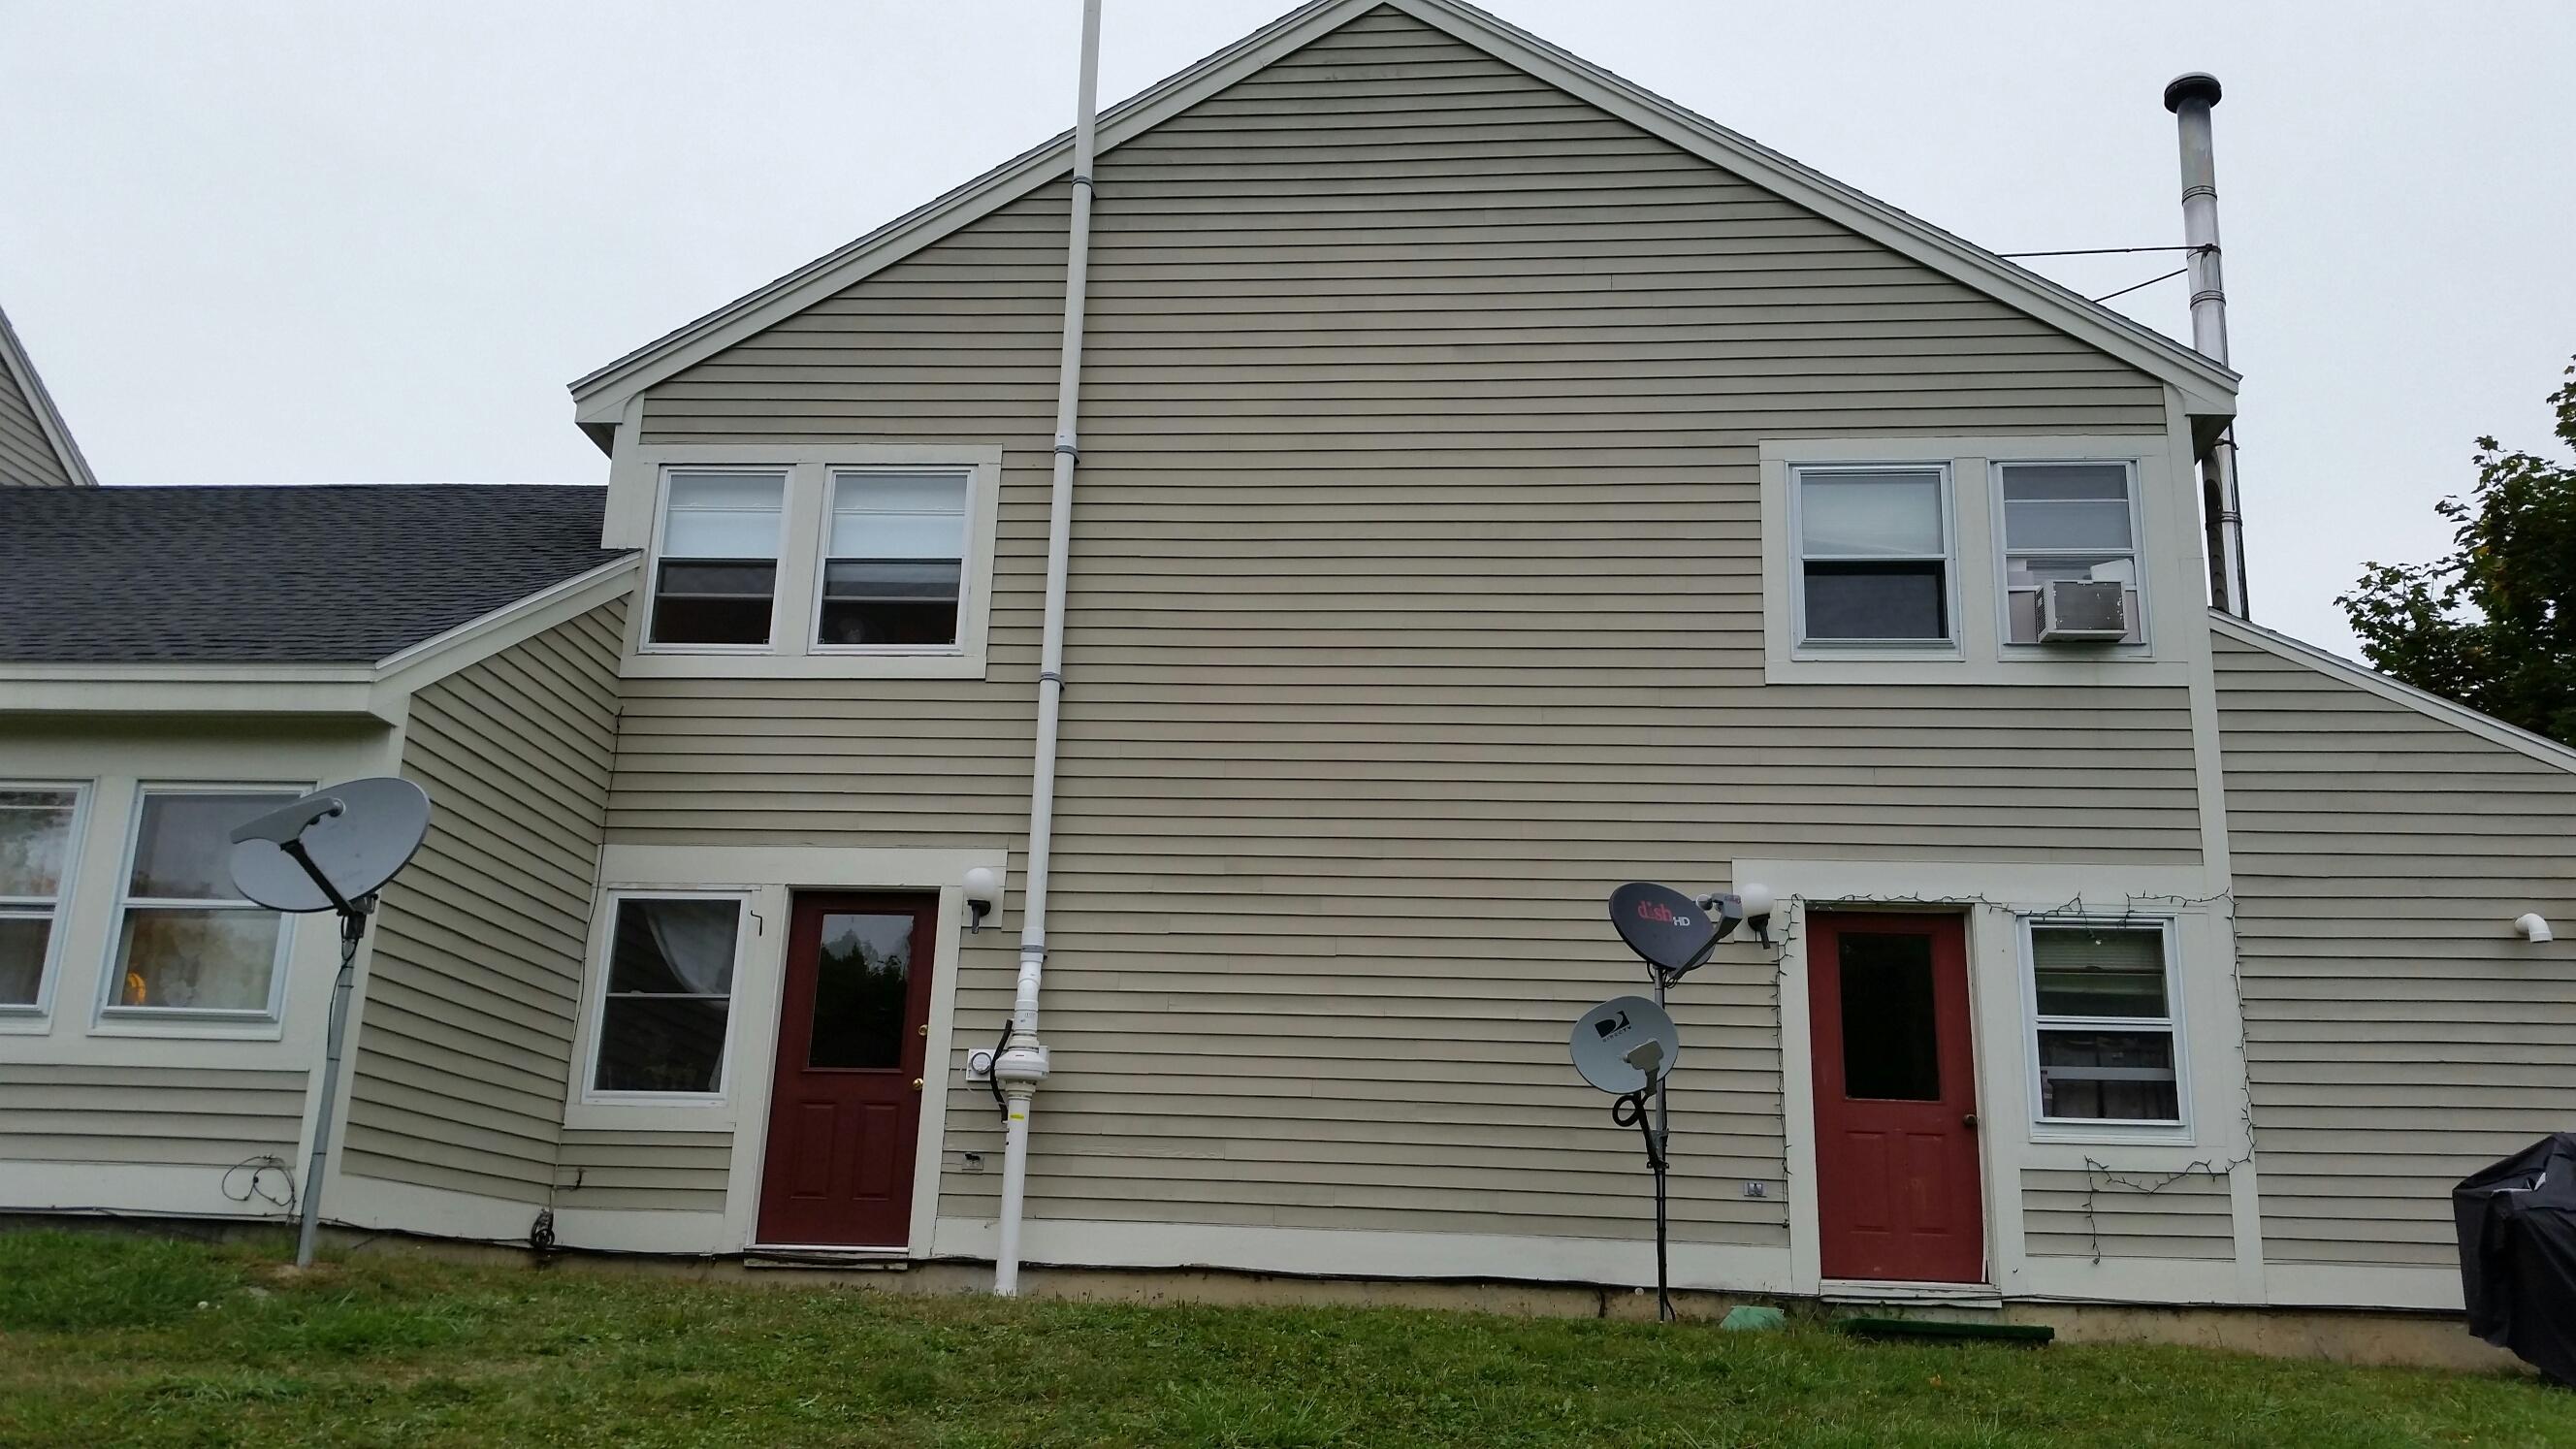 Radon Mitigation job in Waterville at Keystone Apartments